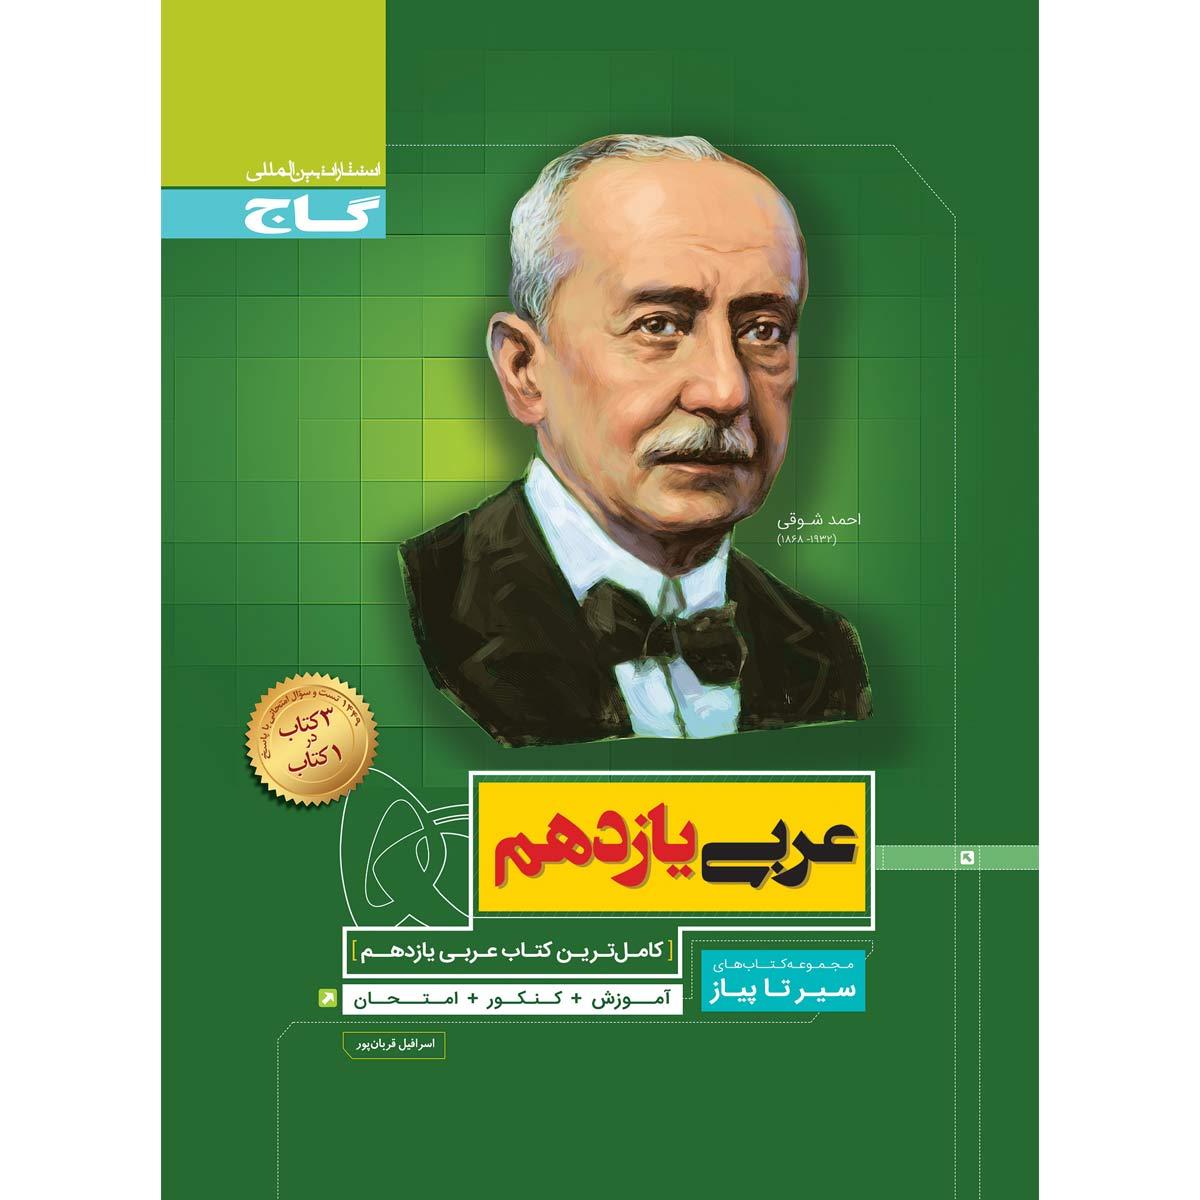 کتاب عربی یازدهم سری سیر تا پیاز انتشارات بین المللی گاج